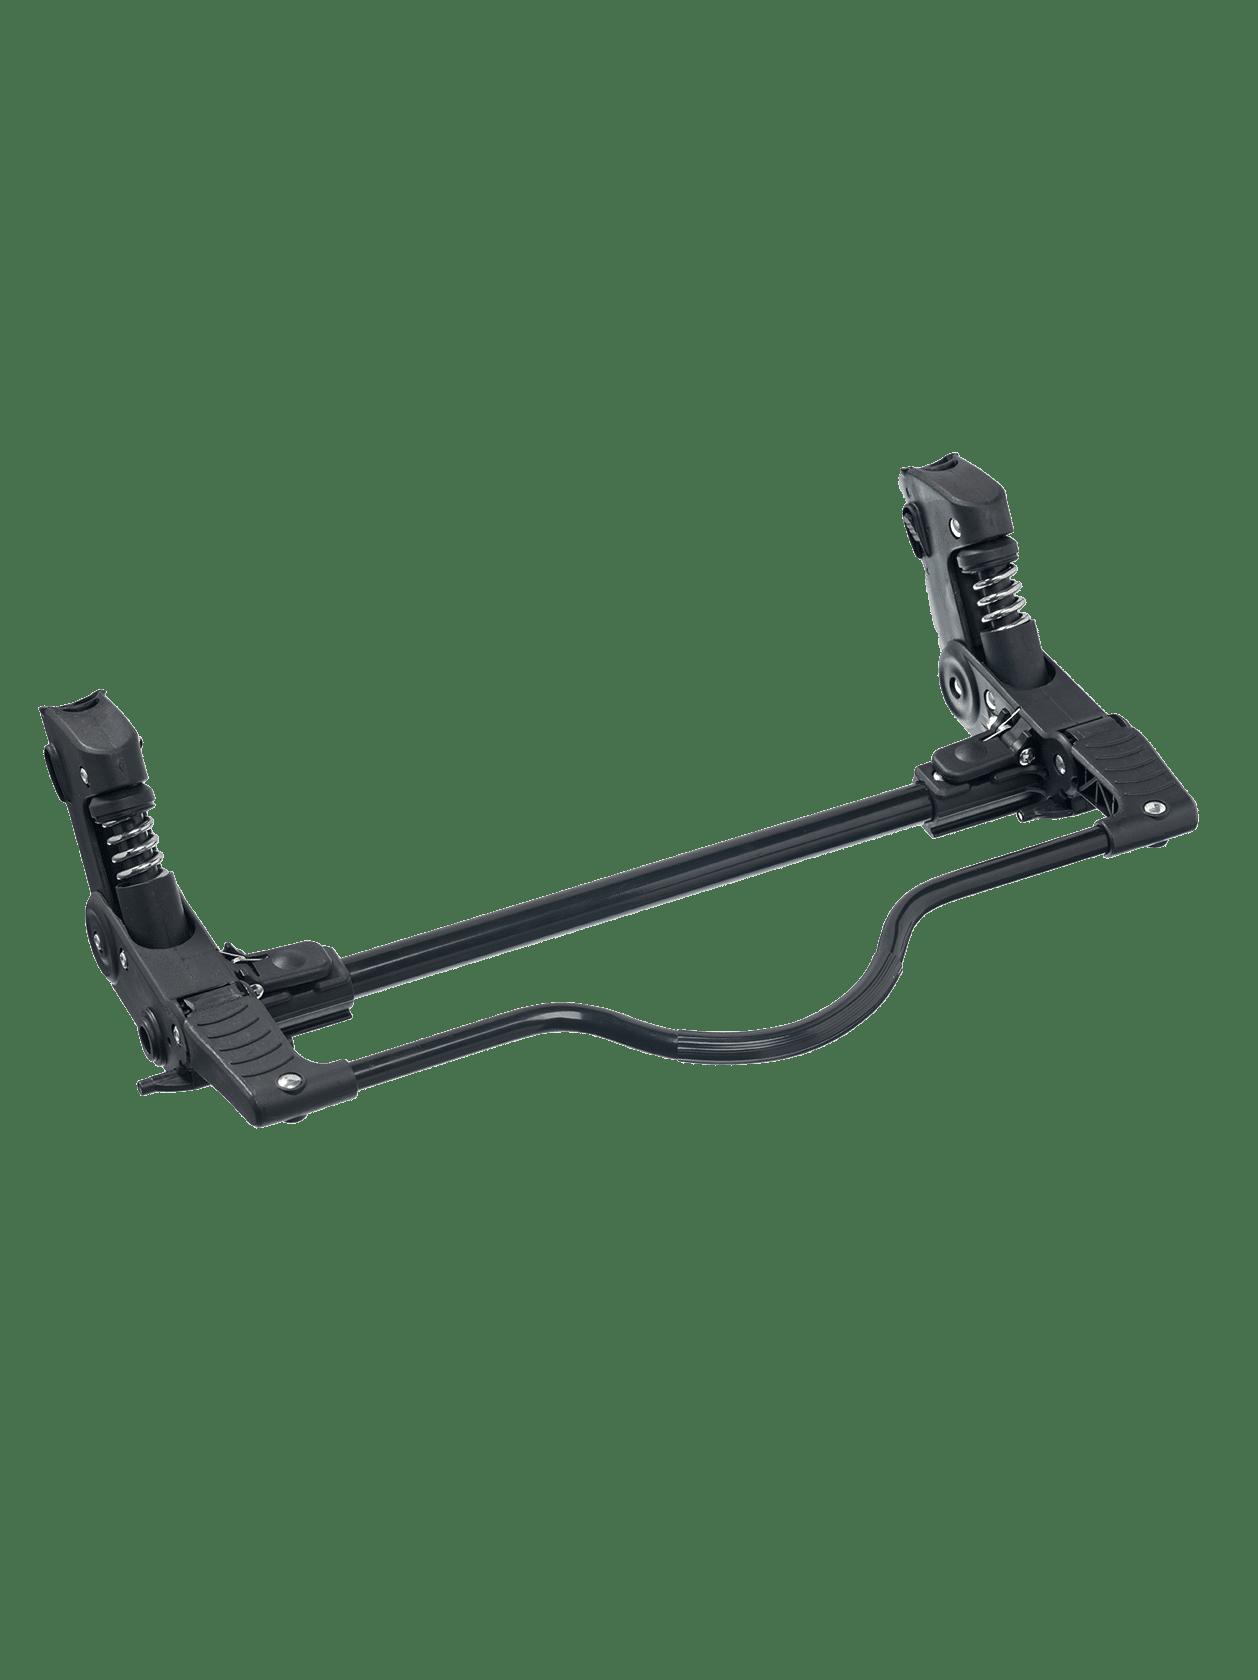 Apple / Pear Rear Axle/Brake Bar